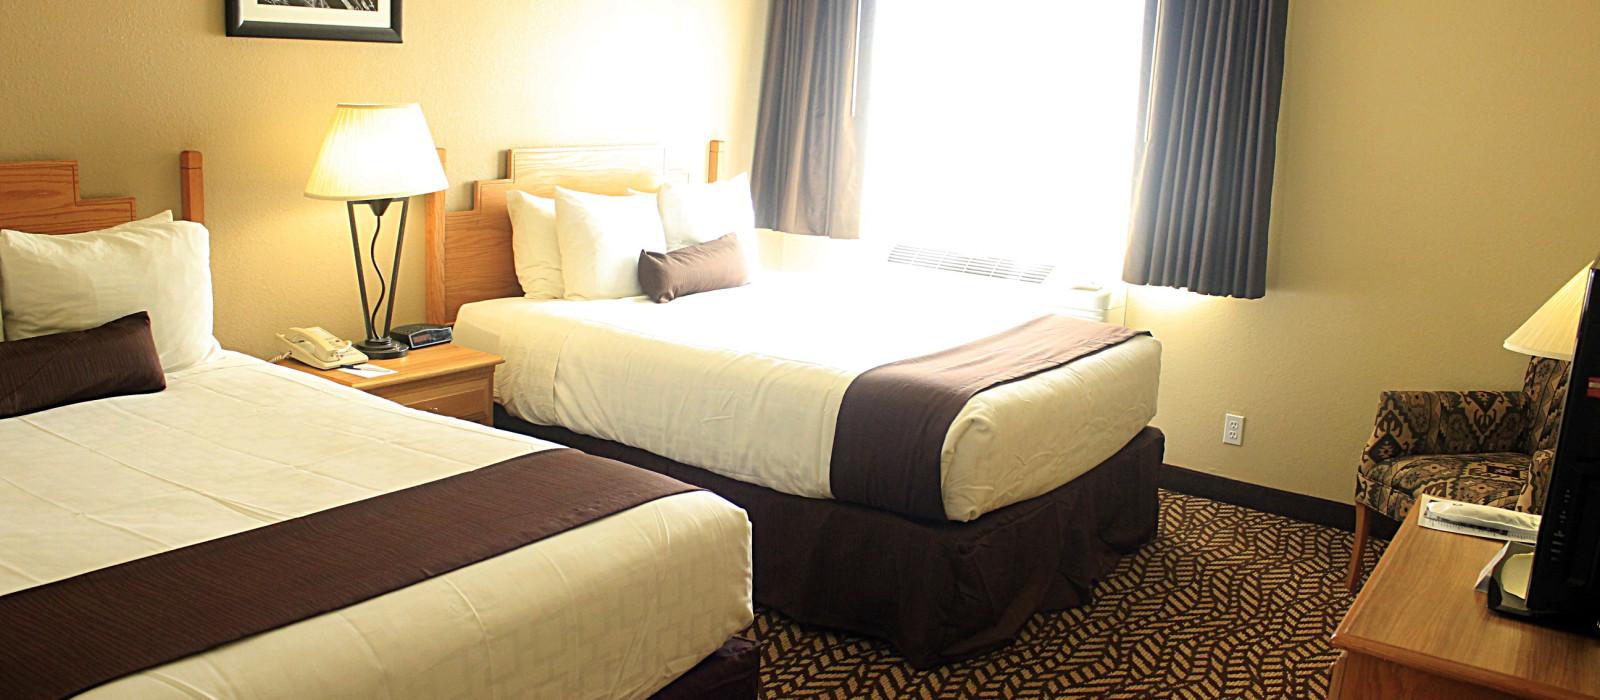 Hotel Best Western Turquoise Inn & Suites %region%